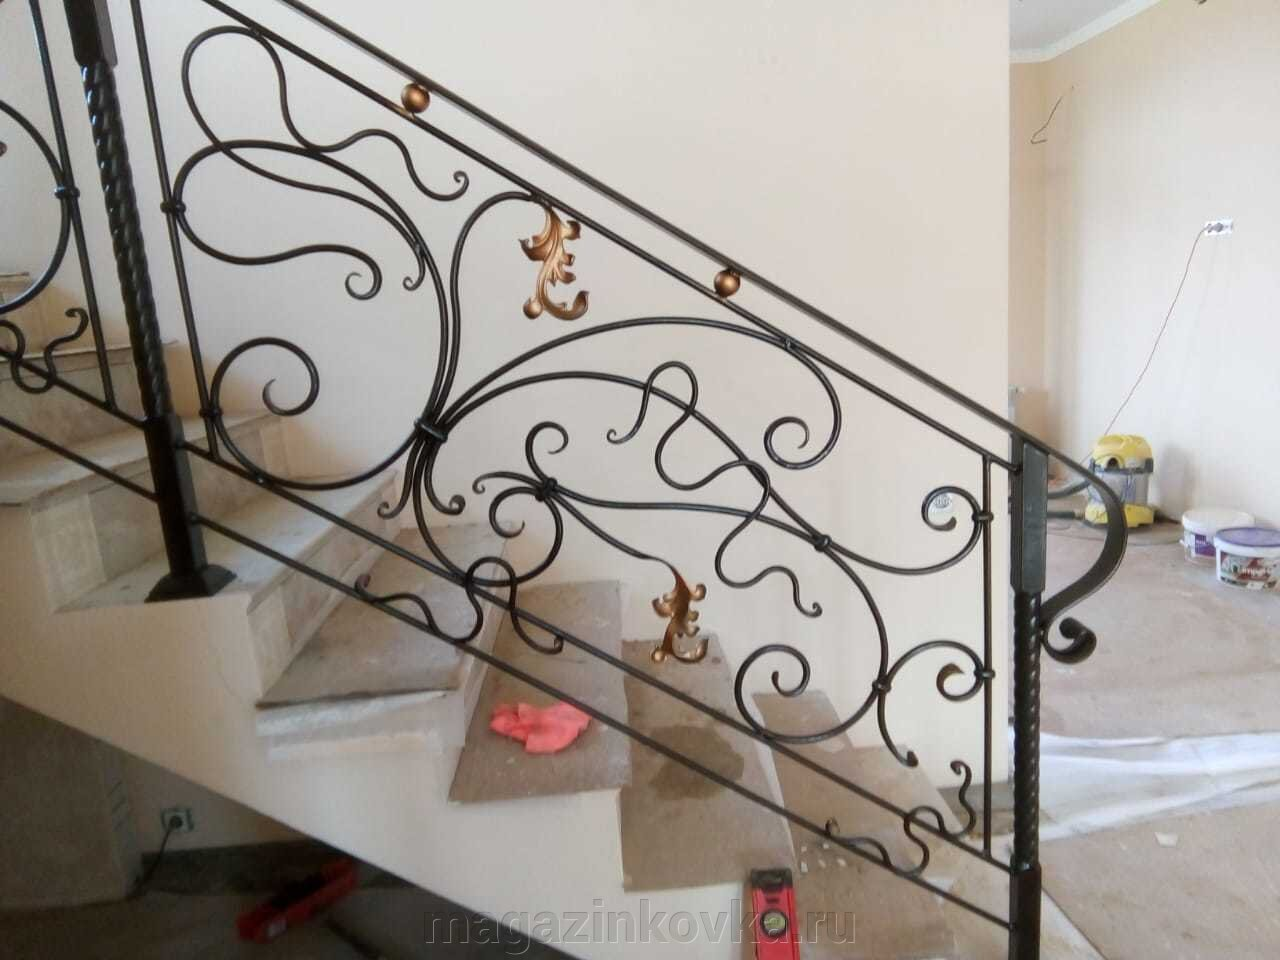 Перила и ограждения для лестниц, балконов, террас - фото pic_12371da7b487e7baa42a0101c246d9f4_1920x9000_1.jpg